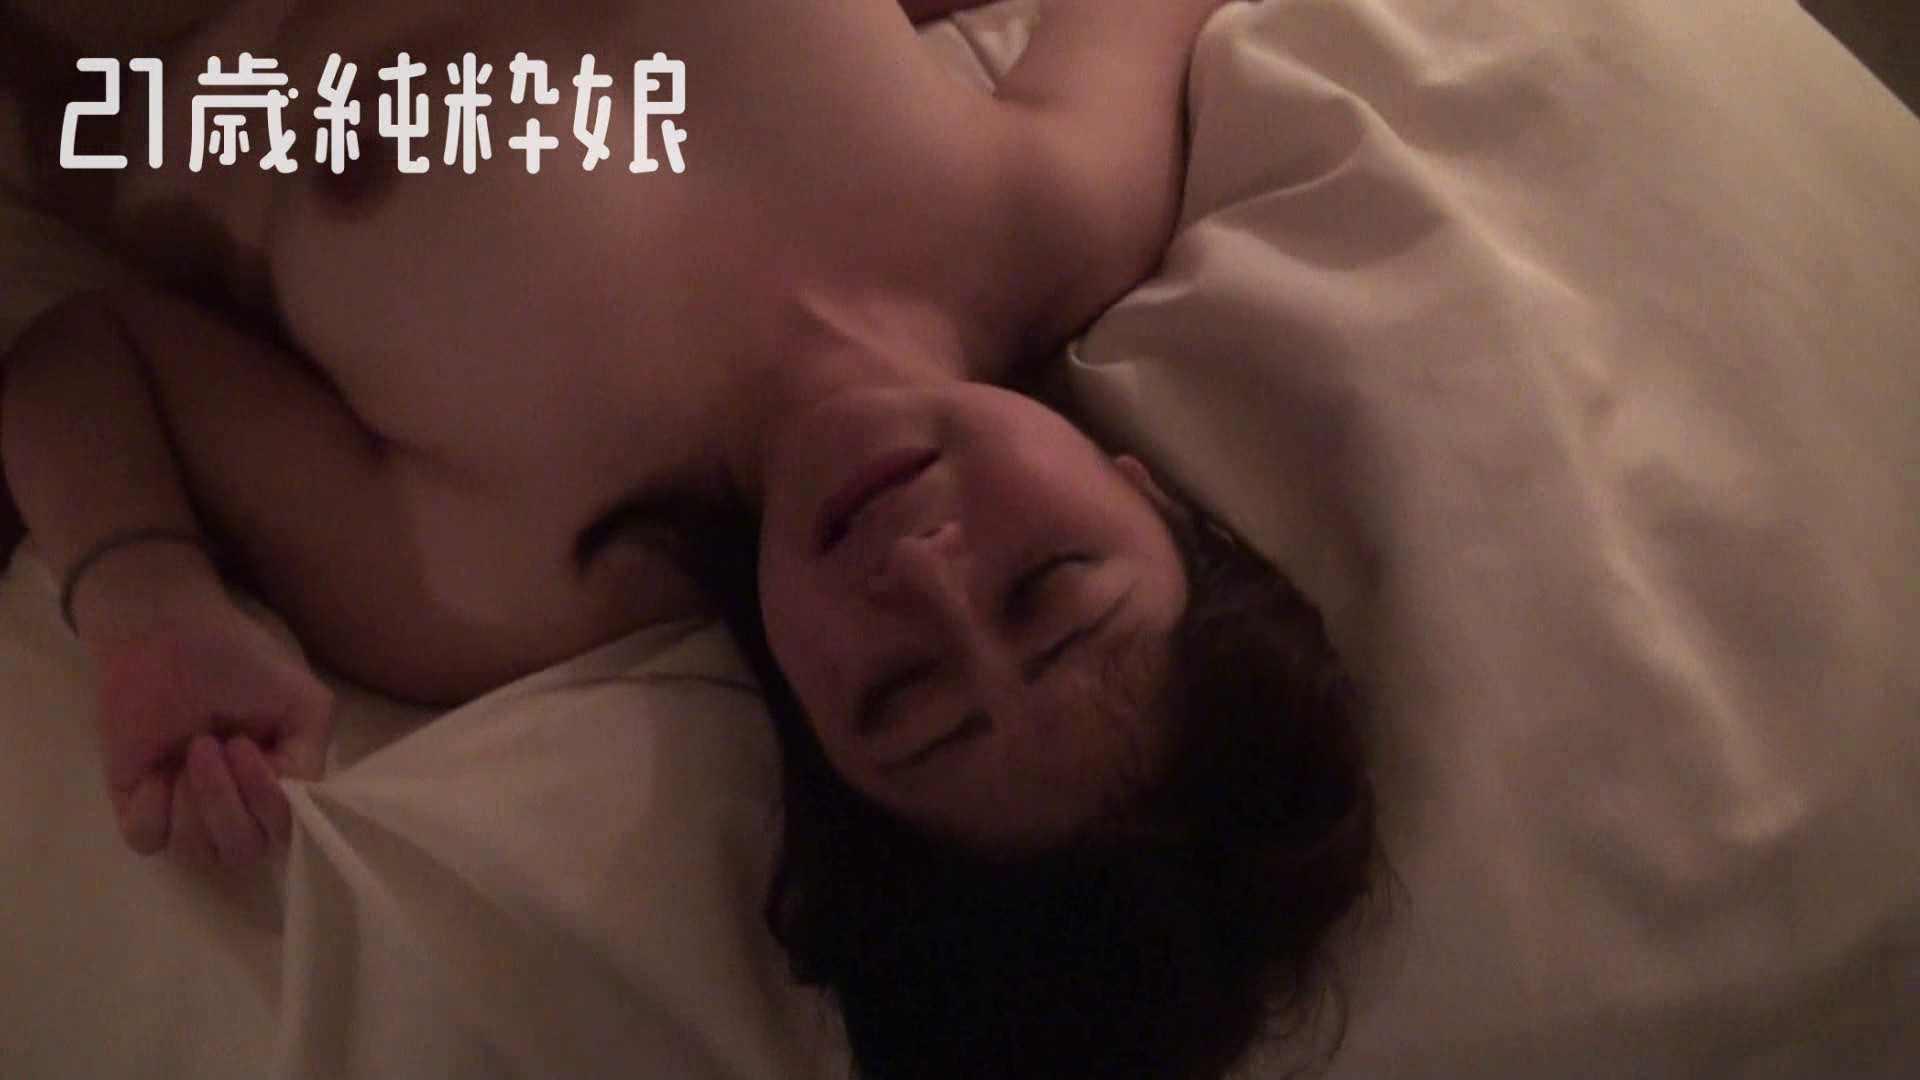 Gカップ21歳純粋嬢第2弾Vol.4 学校 | OLヌード天国  65PIX 55